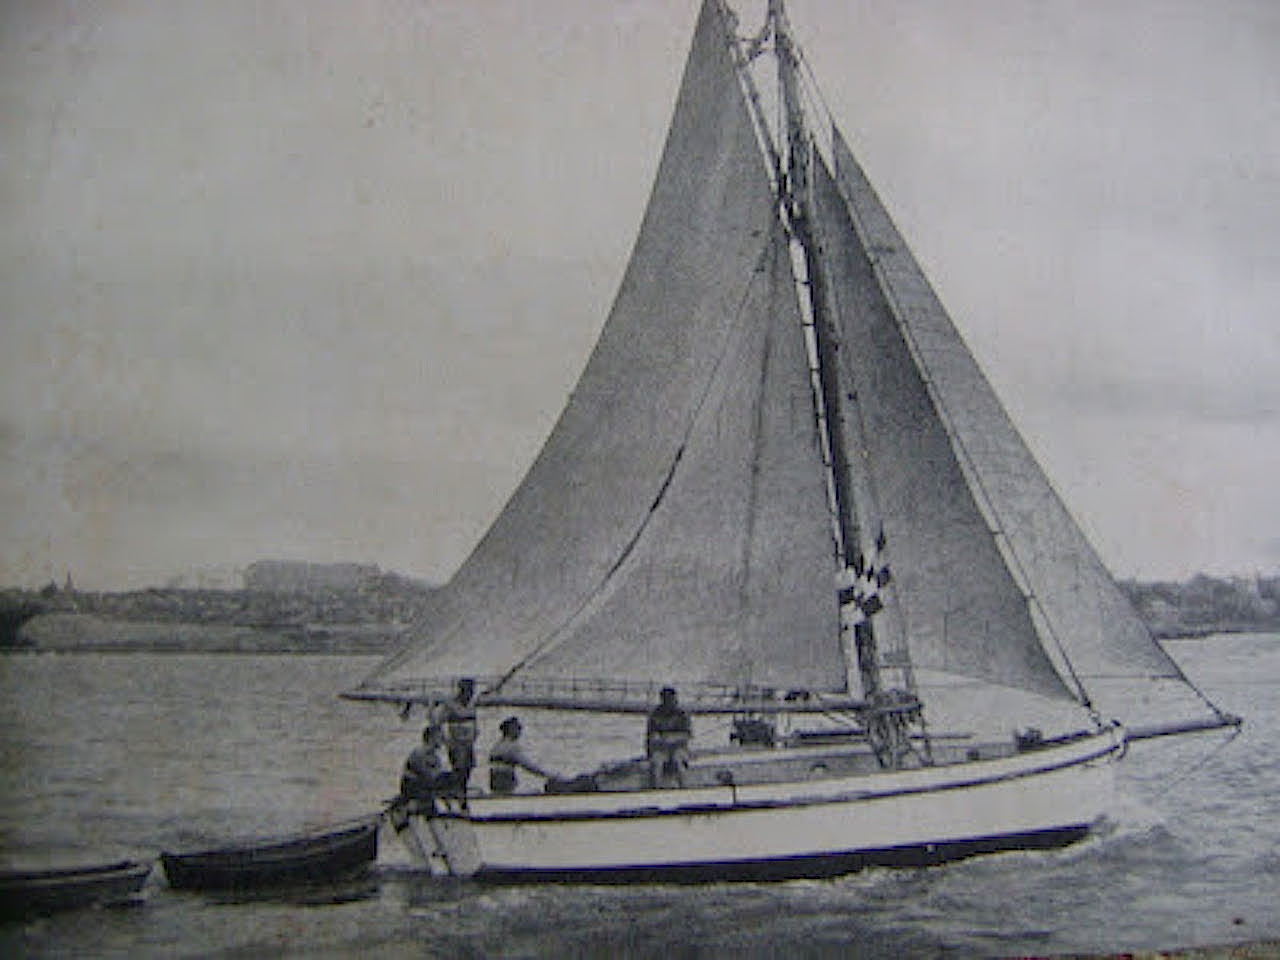 Ngataki sailing